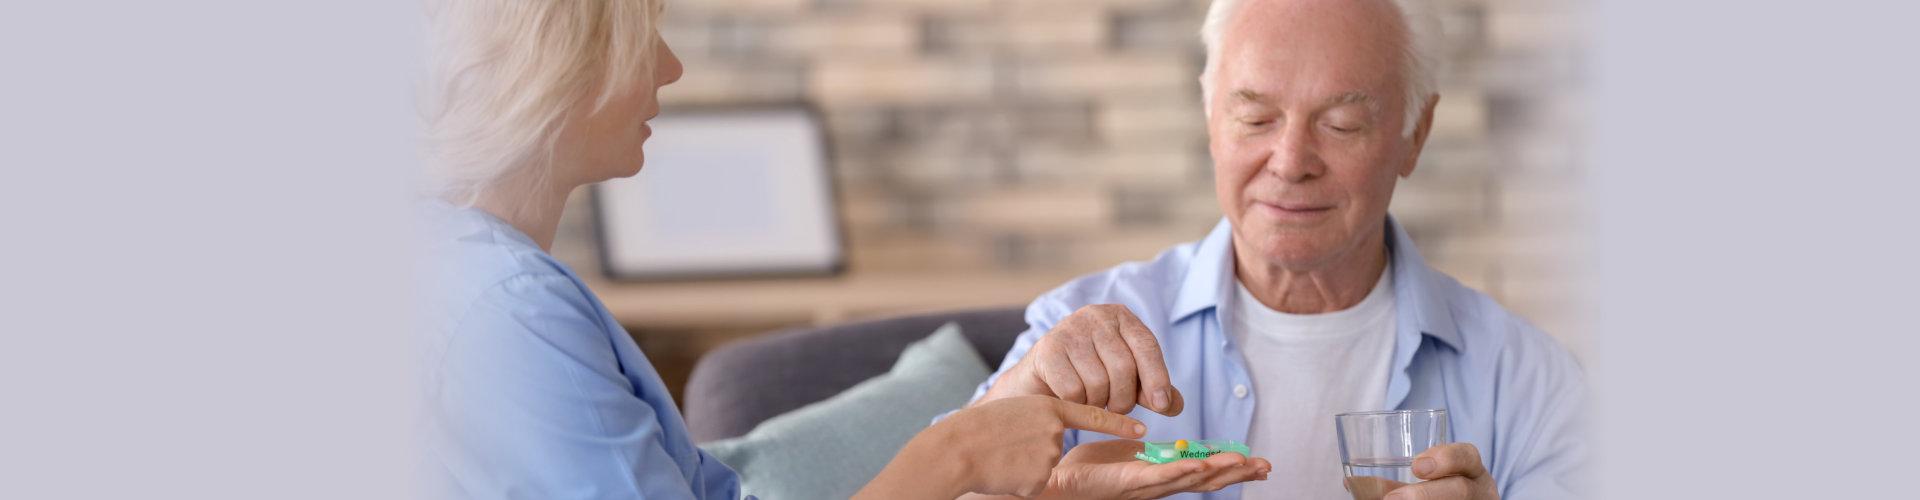 woman giving medicine to senior men at home